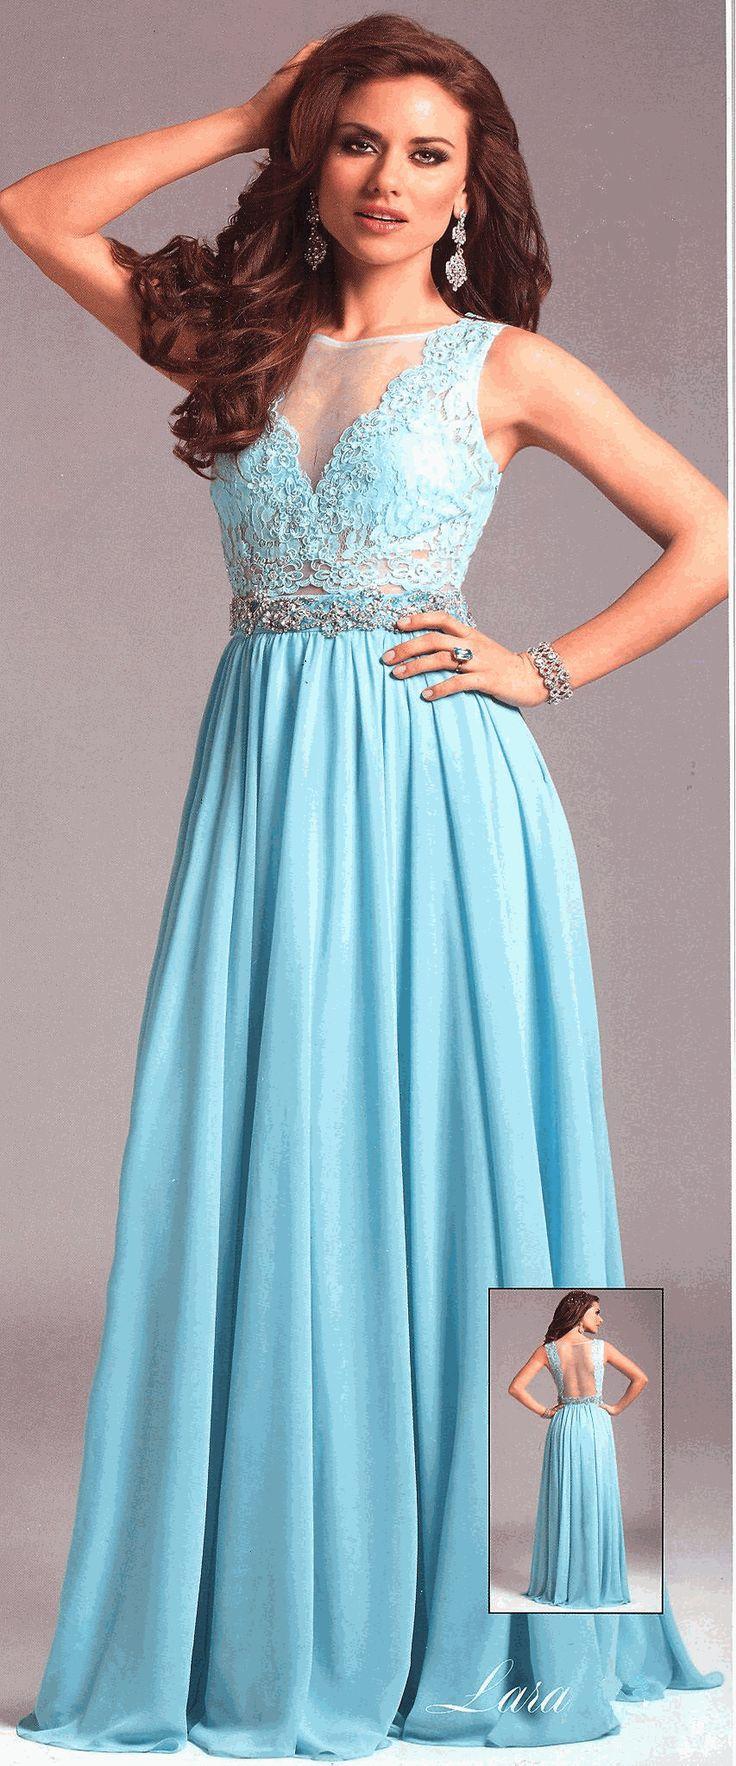 Lara design prom dresses - Prom dress style